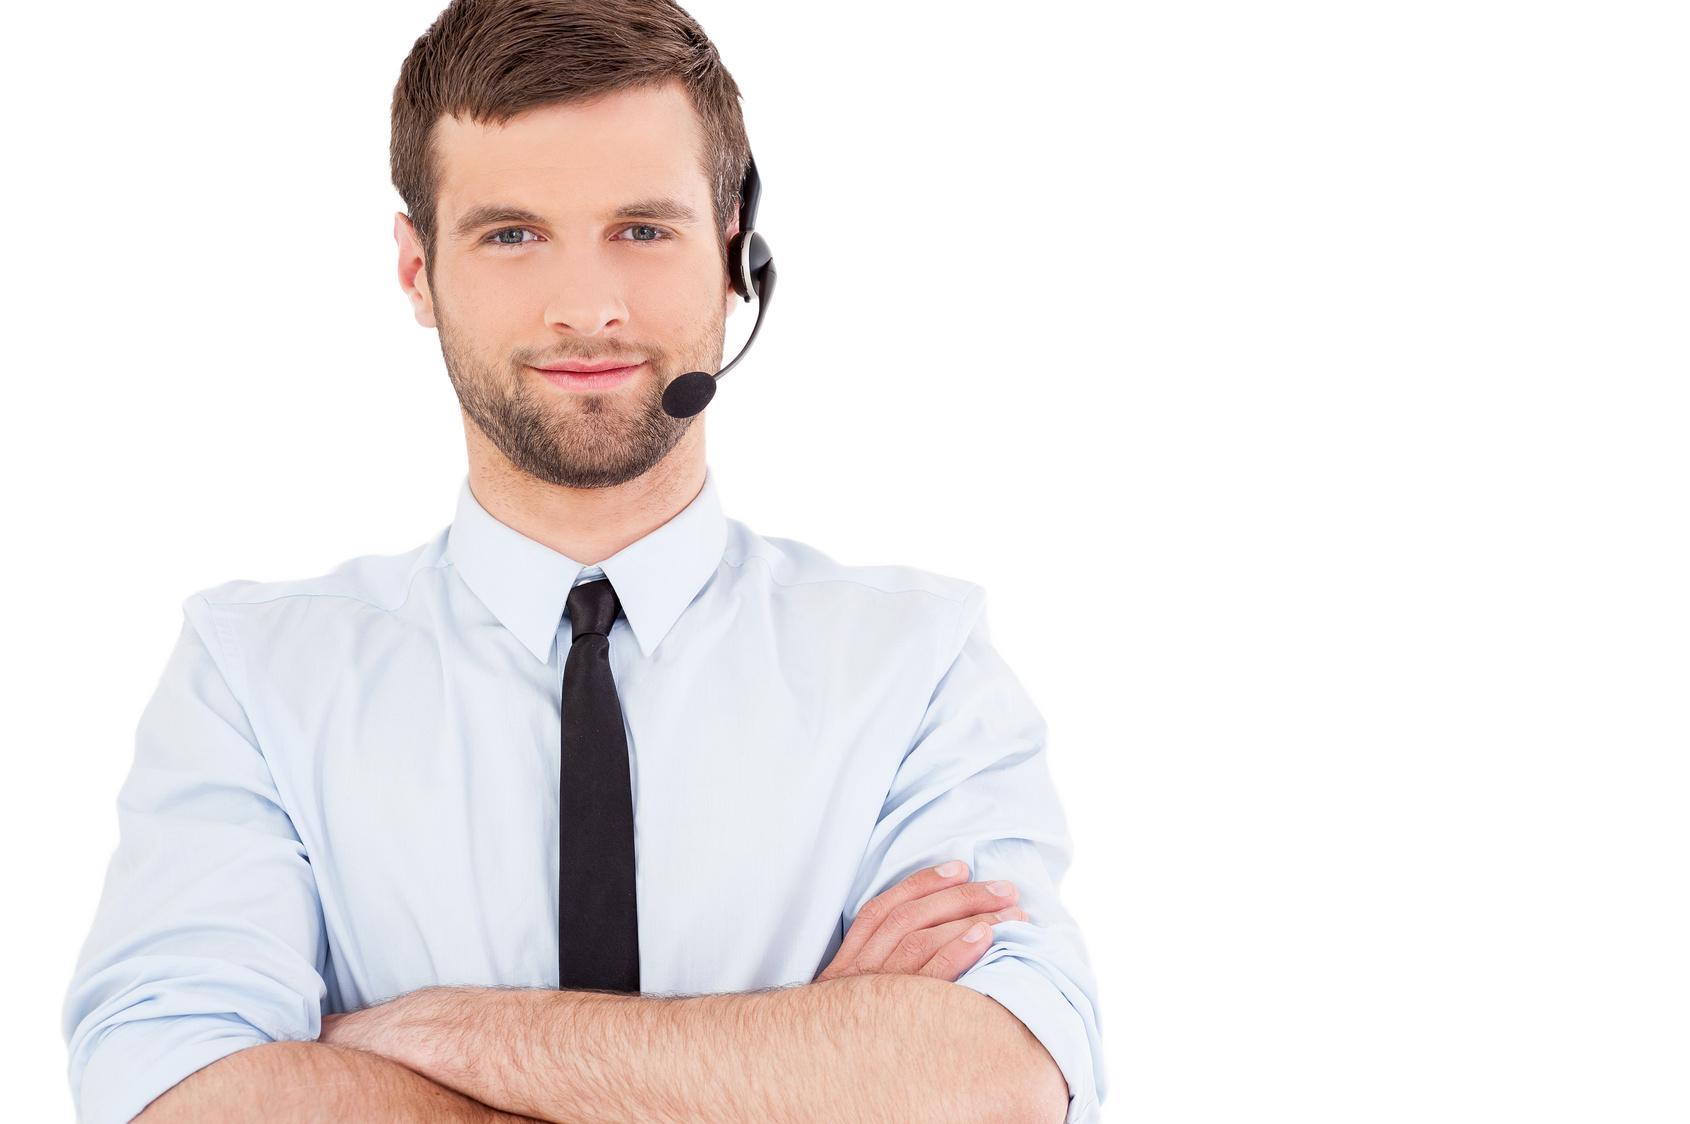 contact center supervisor